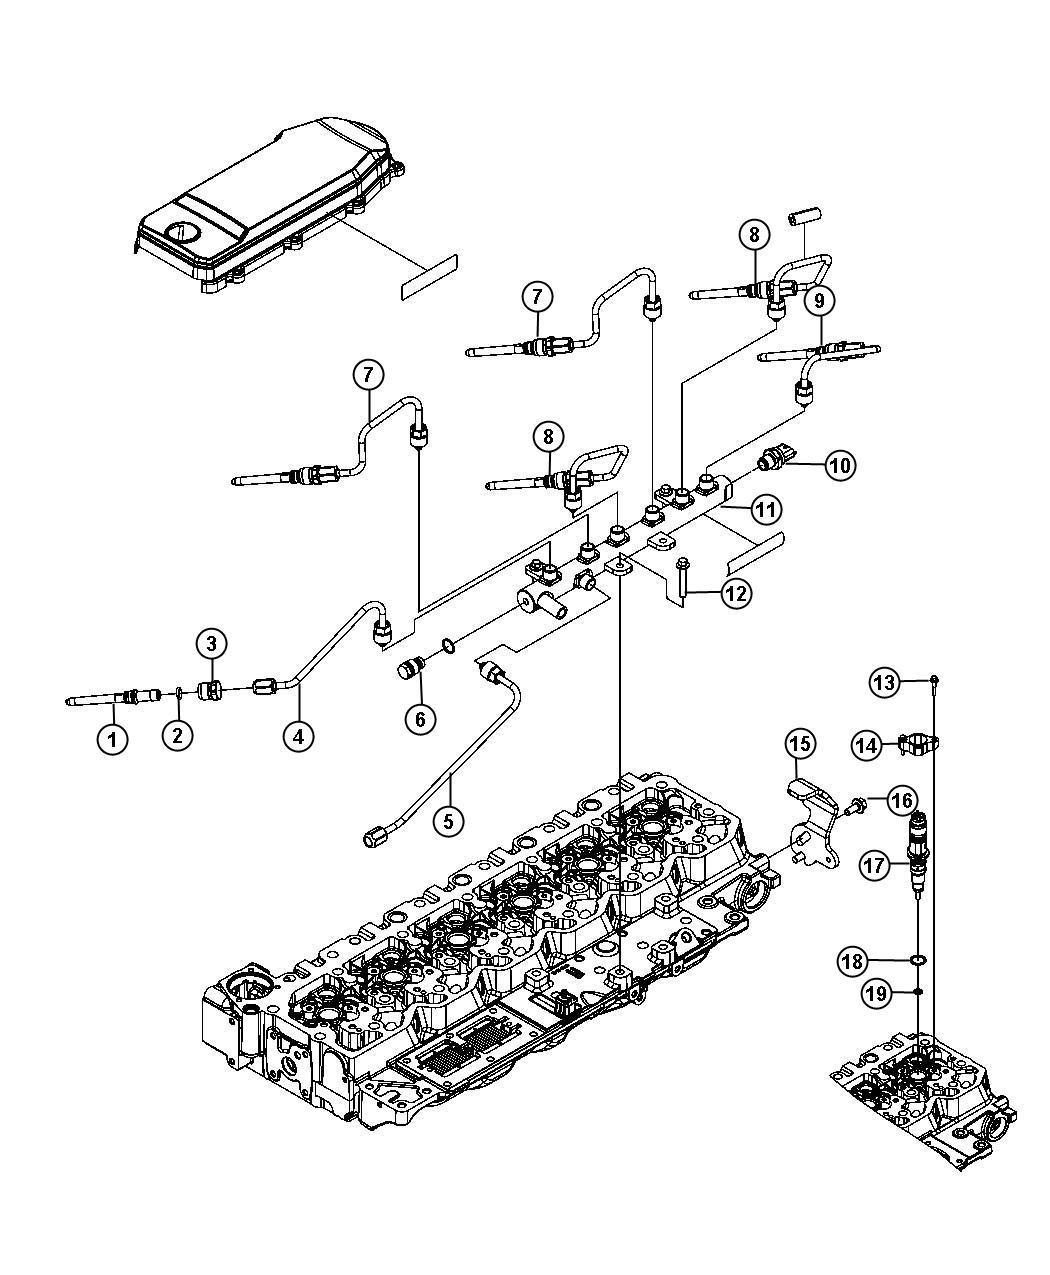 Dodge Ram Injector Fuel Export Emissions